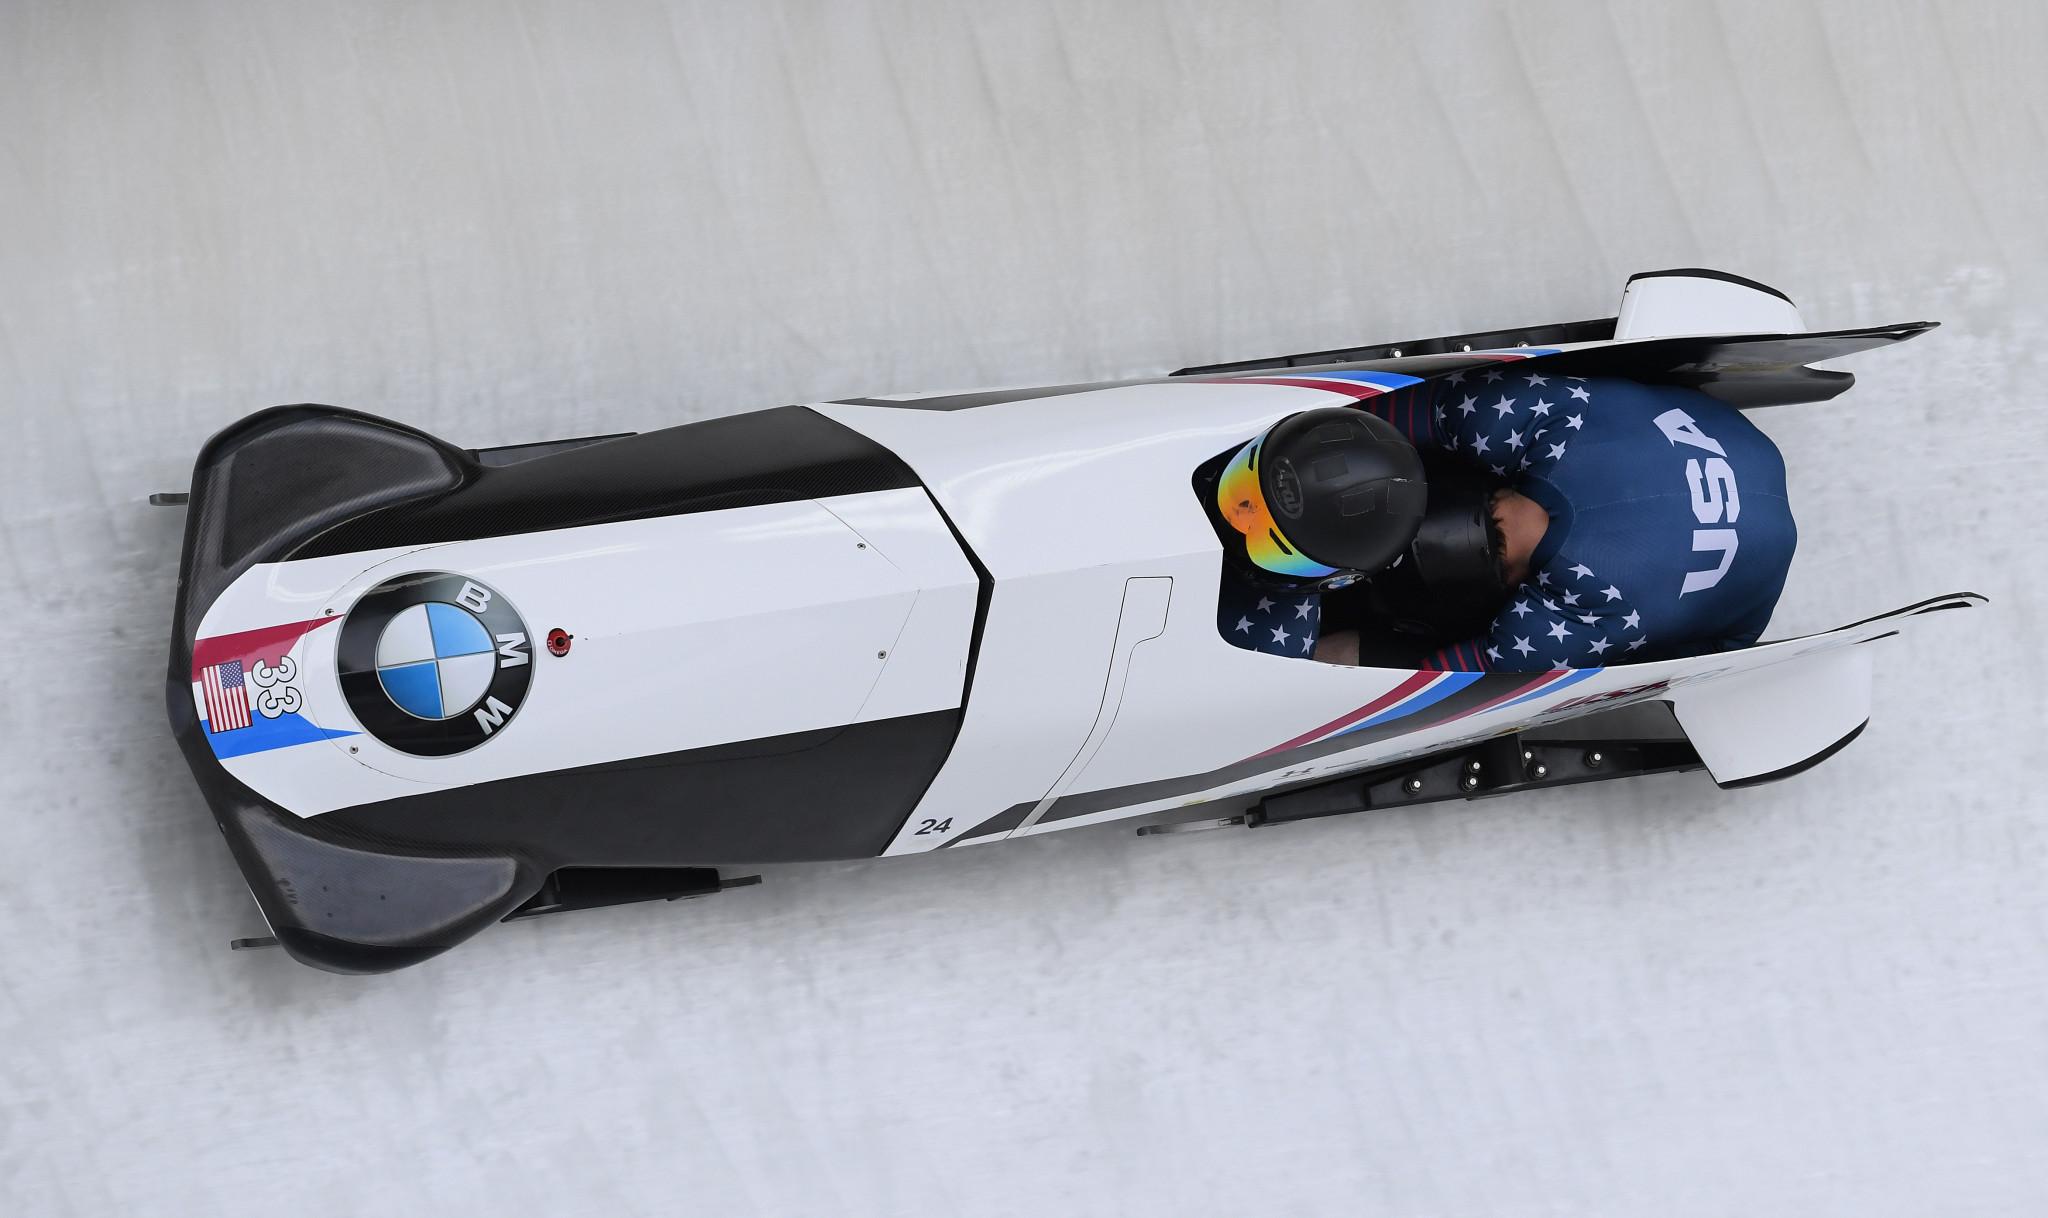 Bascue, Olsen and Cunningham headline US men's bobsled squad for 2017-2018 season